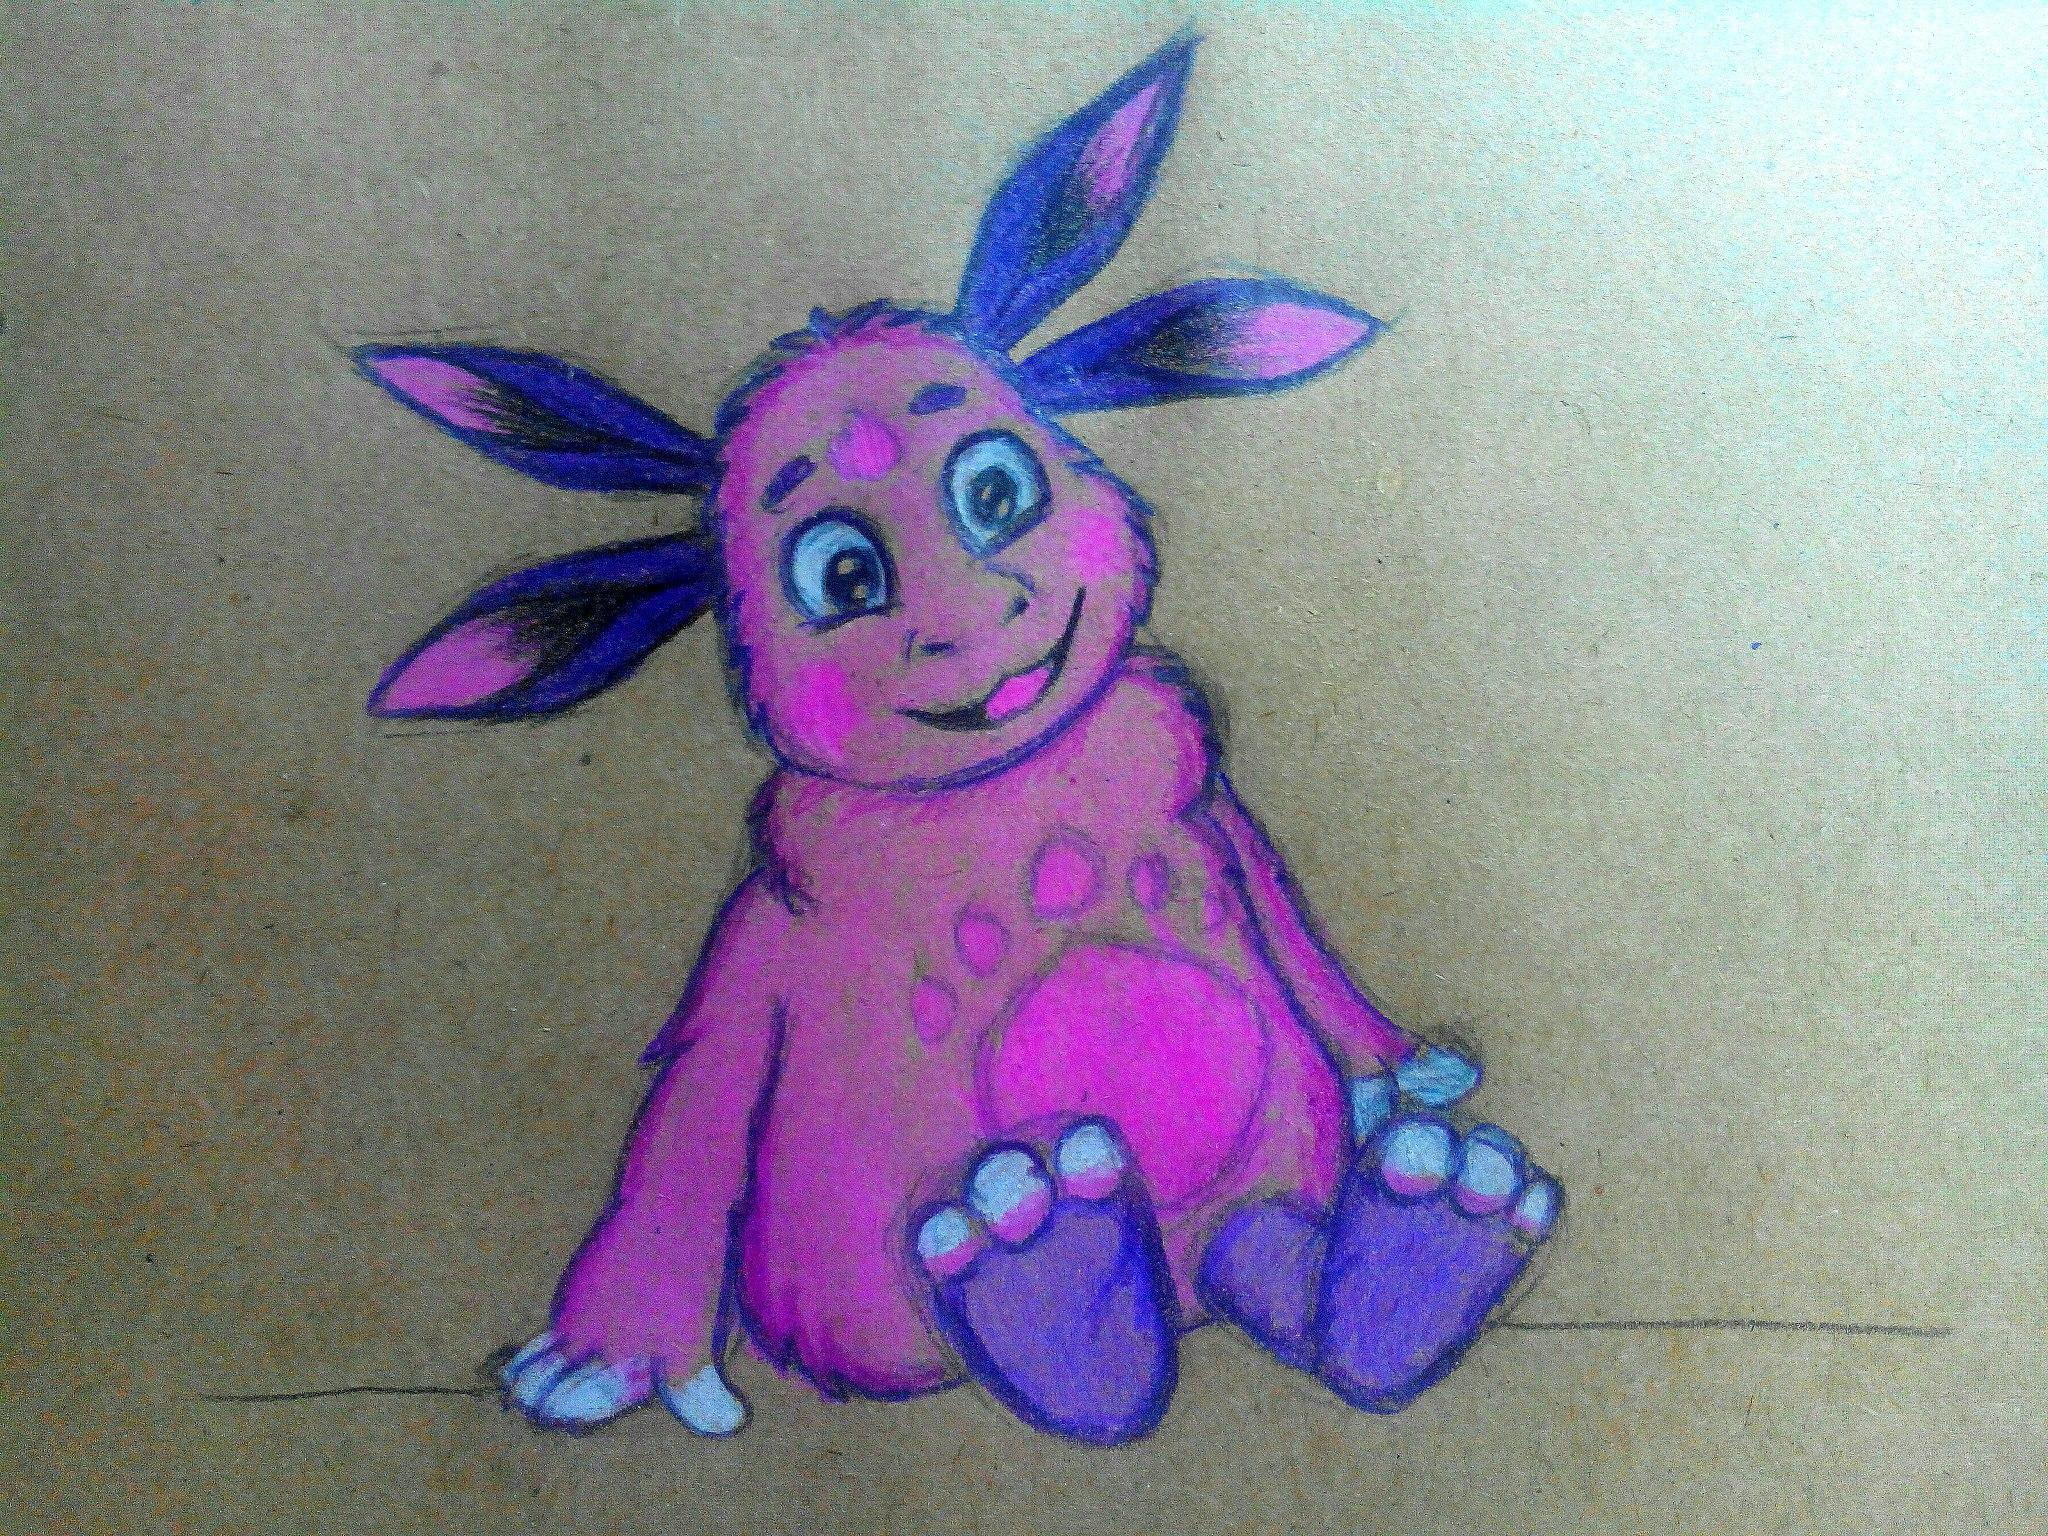 Как нарисовать Лунтика карандашом поэтапно